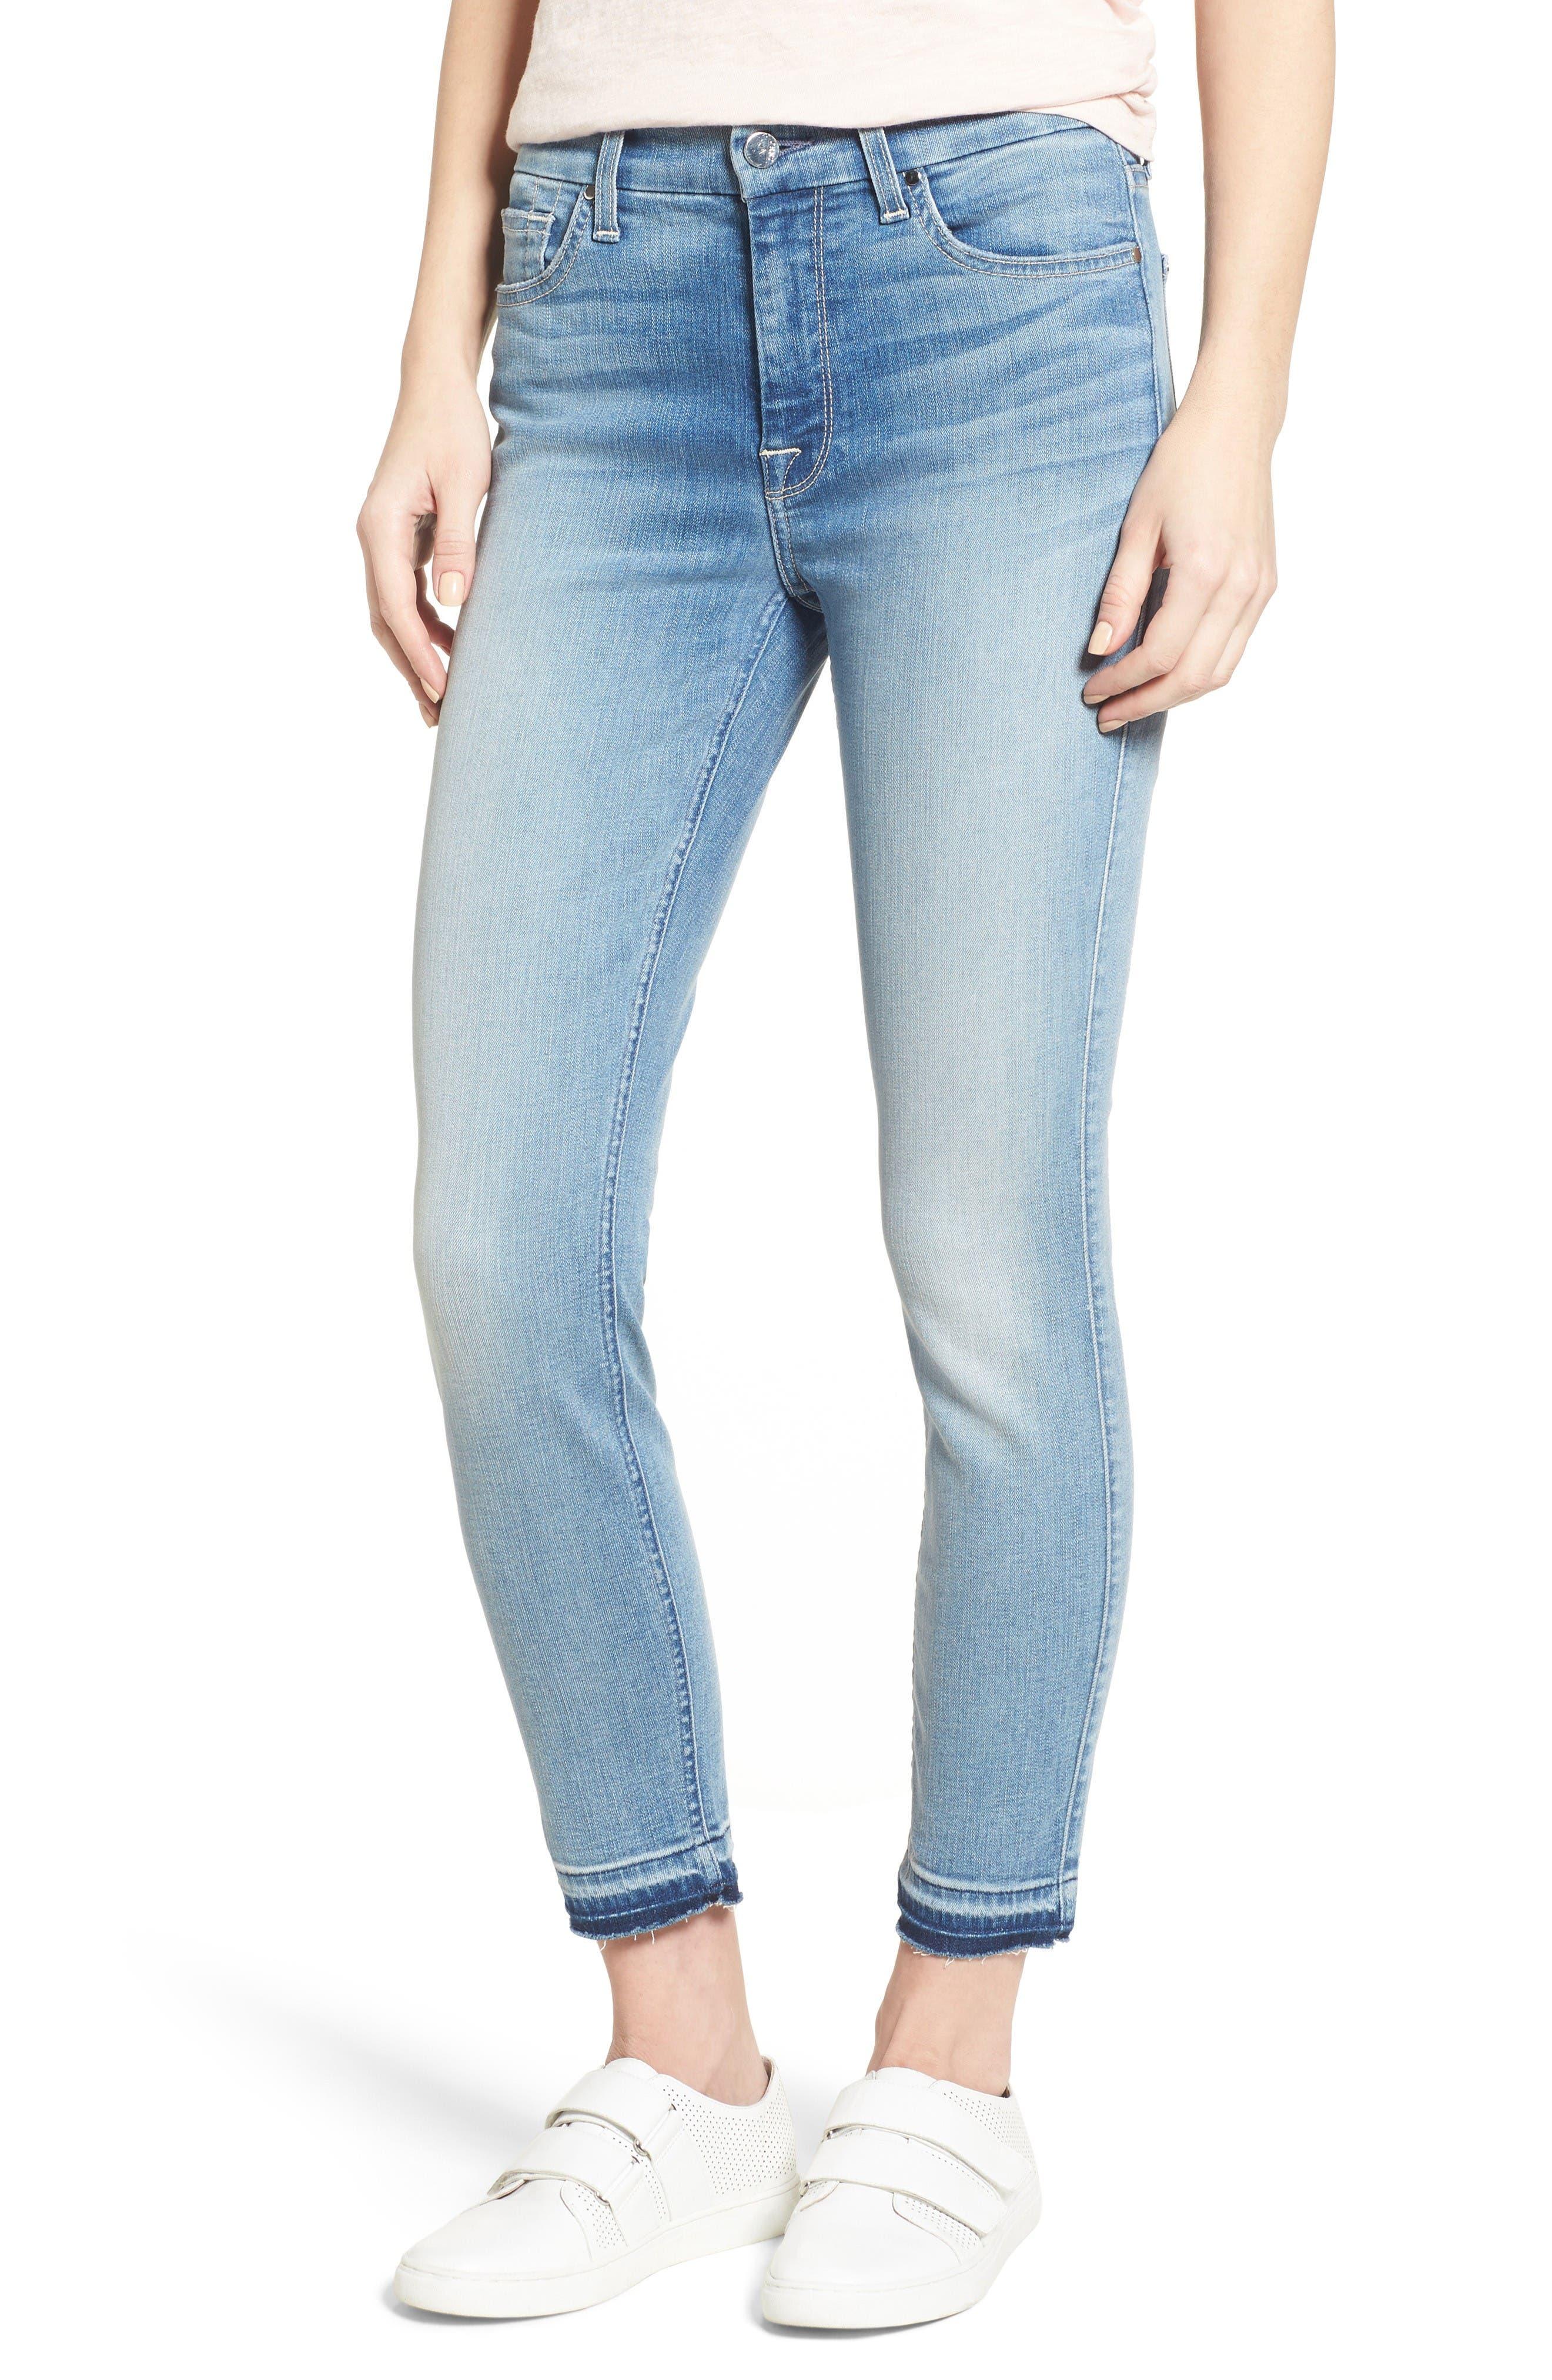 JEN7 Release Hem Stretch Ankle Skinny Jeans